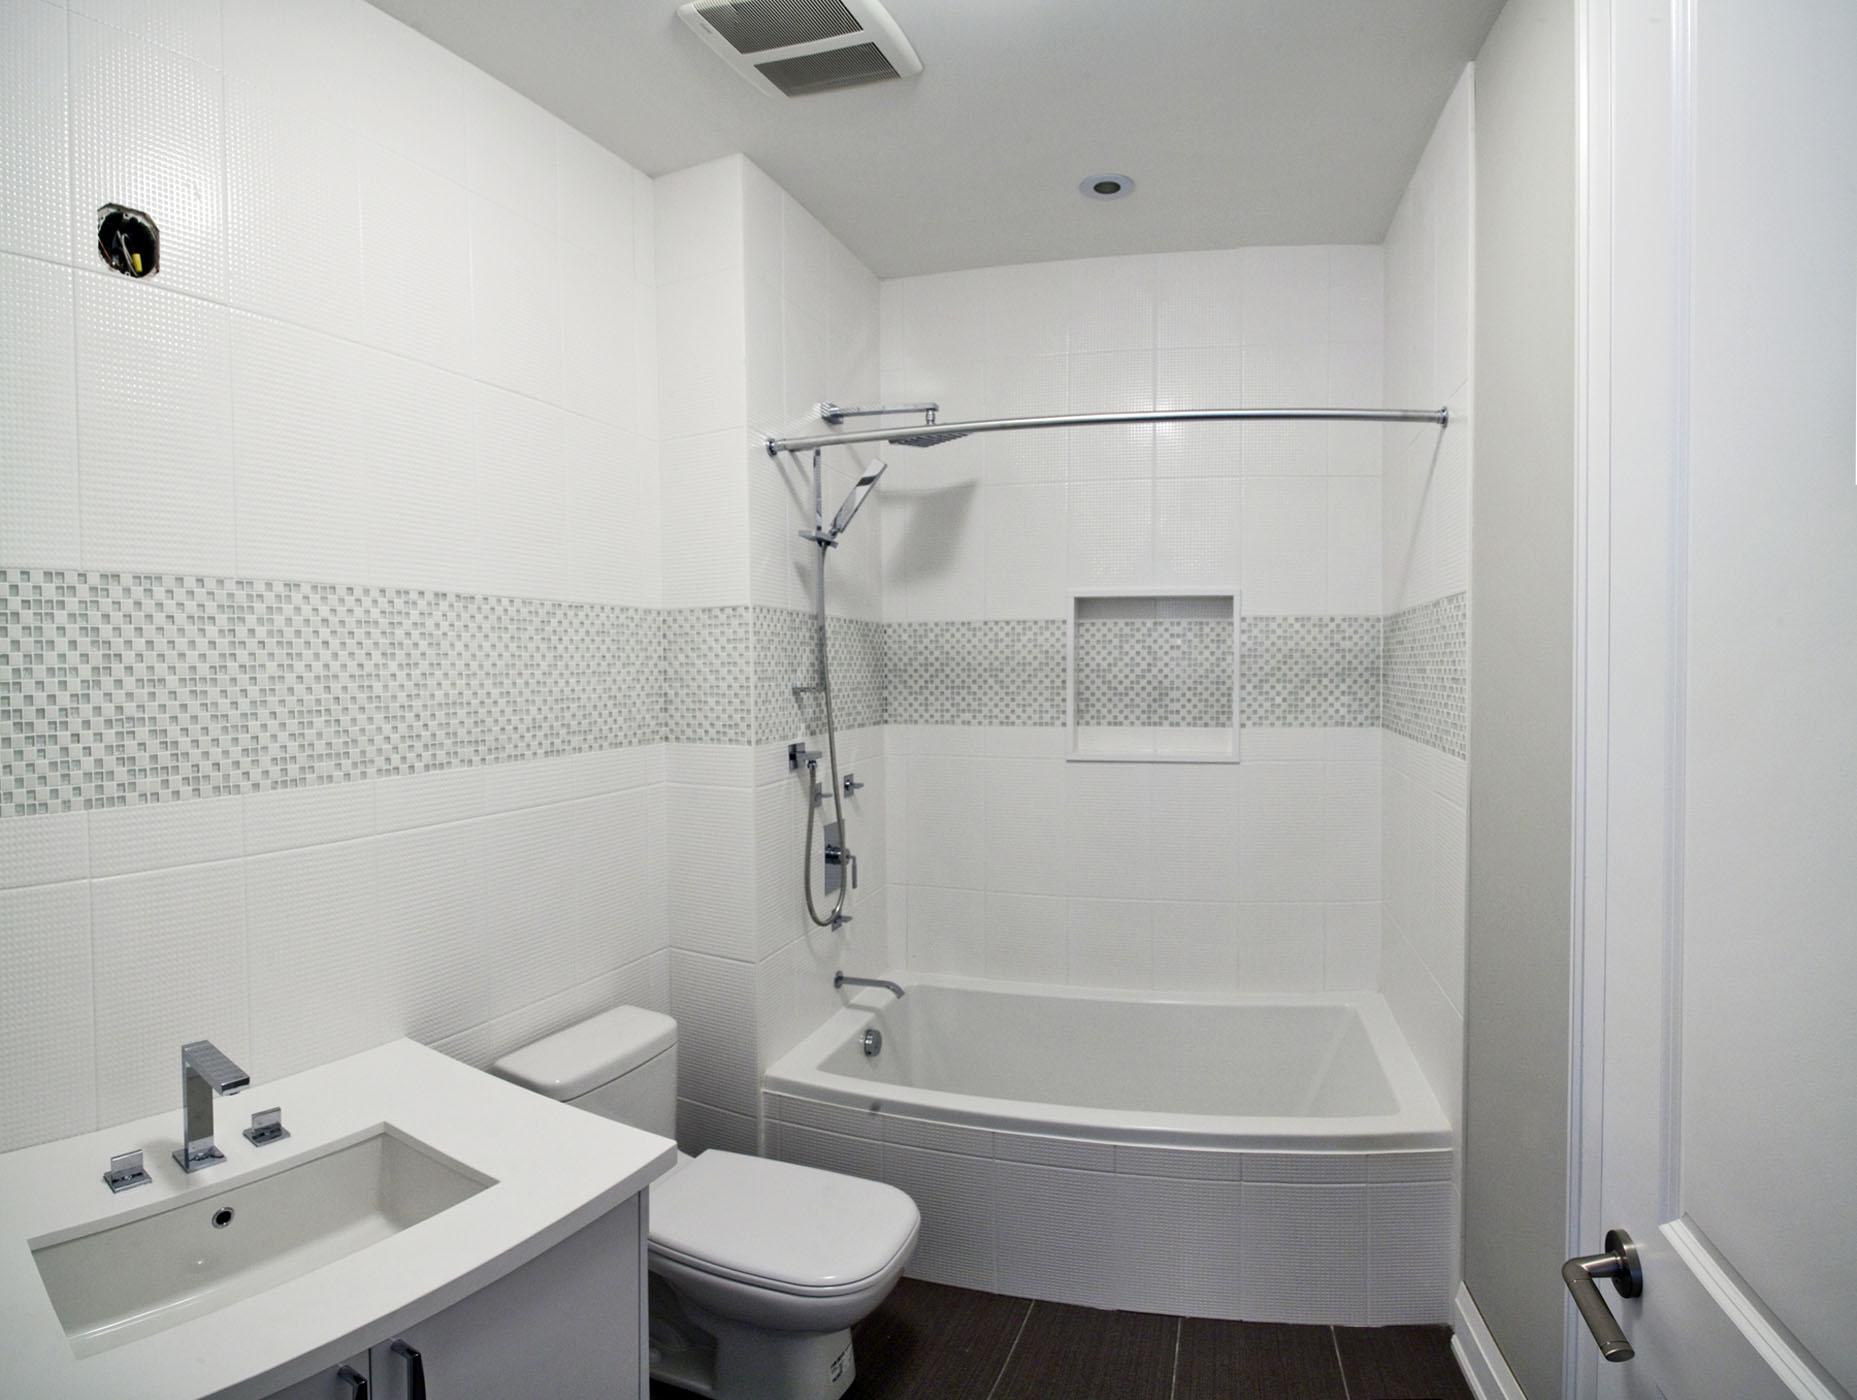 Copy of Bathrm21.jpg